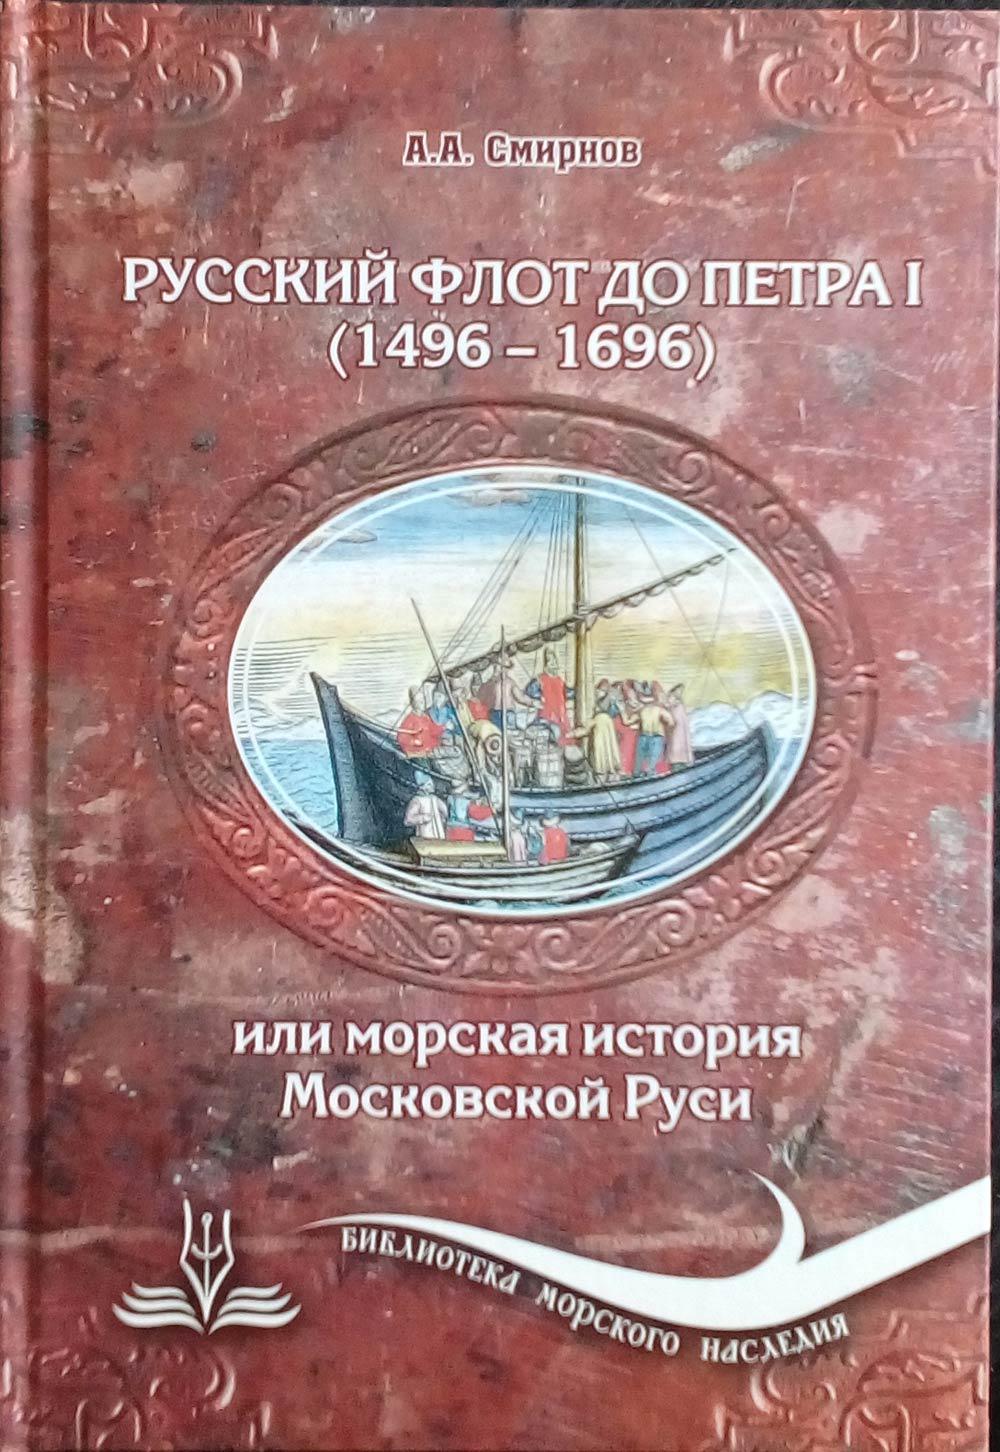 Смирнов А. А. Русский флот до Петра I (1496-1696)